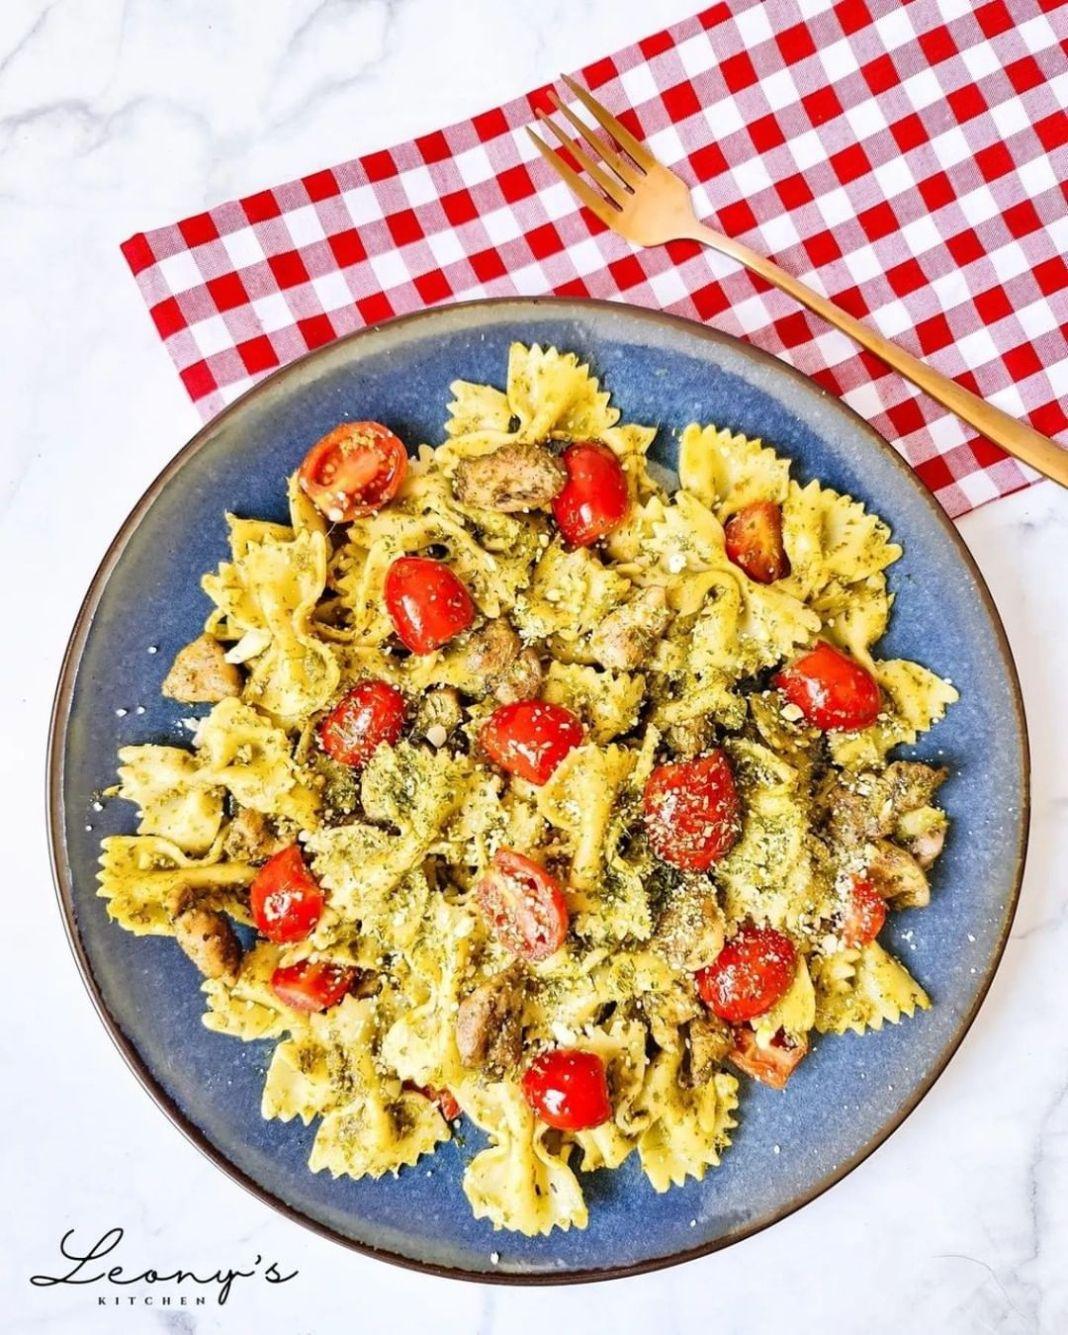 Info kuliner, masak ala ala italian yuuuk! bikin pasta inii  Chicken pesto pasta  4 servings  INGREDIENTS: 1 …